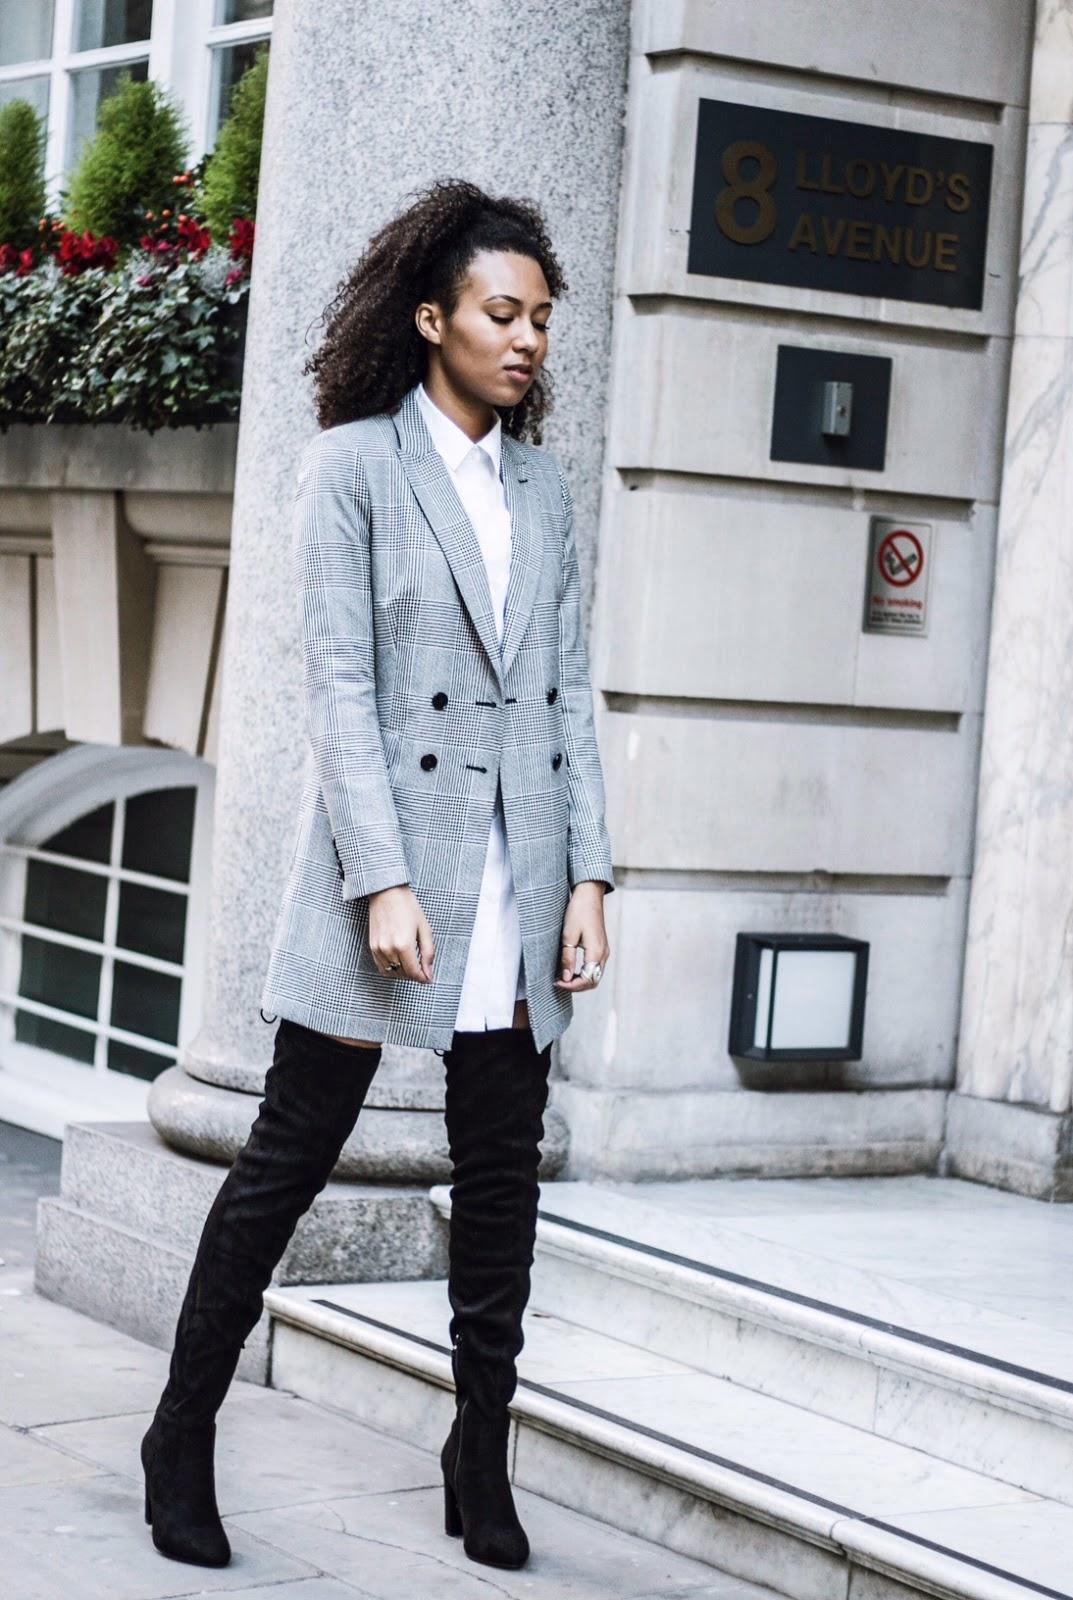 reiss vale 1975 longline blazer jacket street style